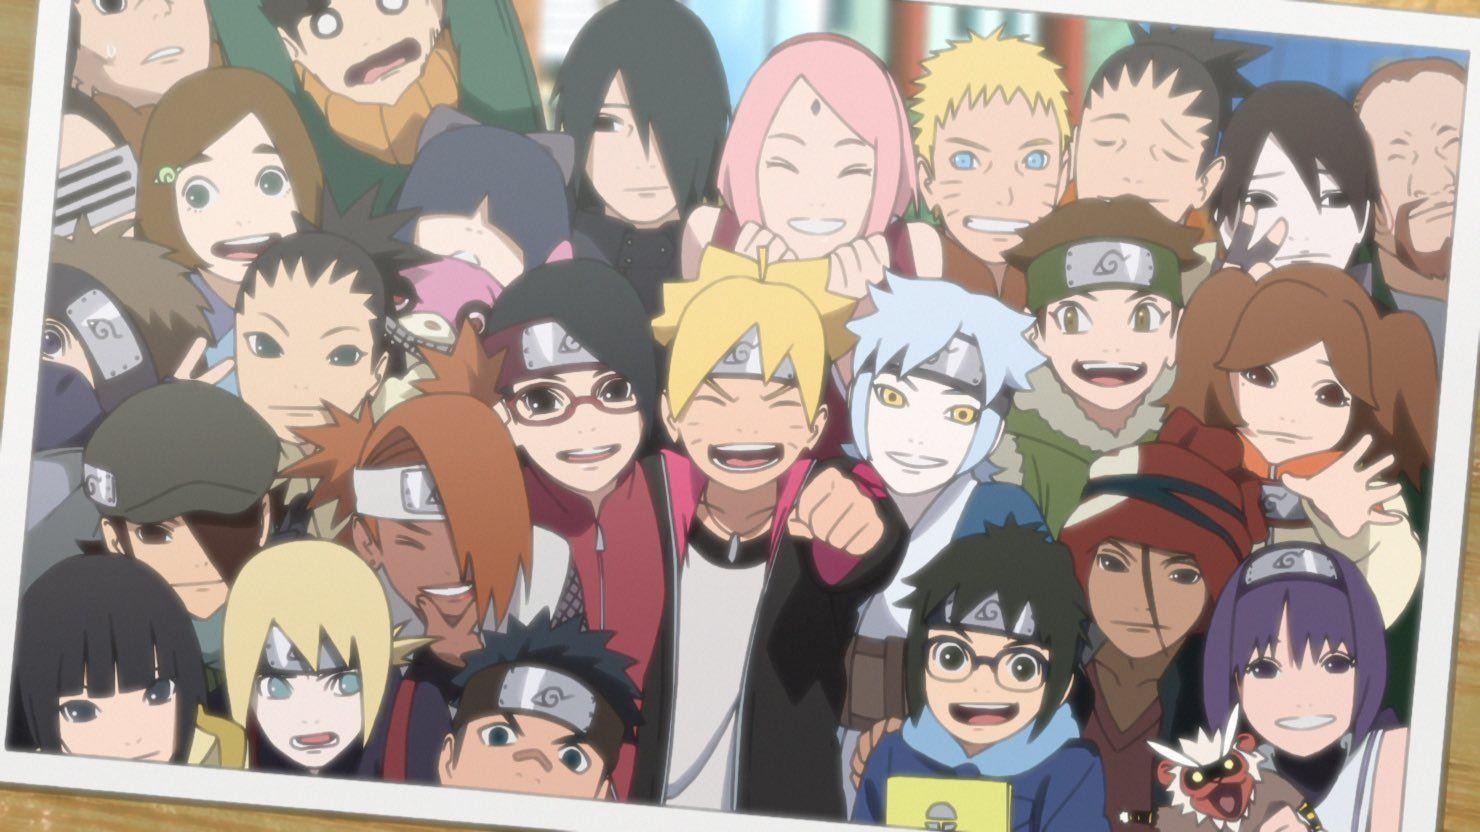 Wallpaper Keren Naruto Dan Boruto In 2020